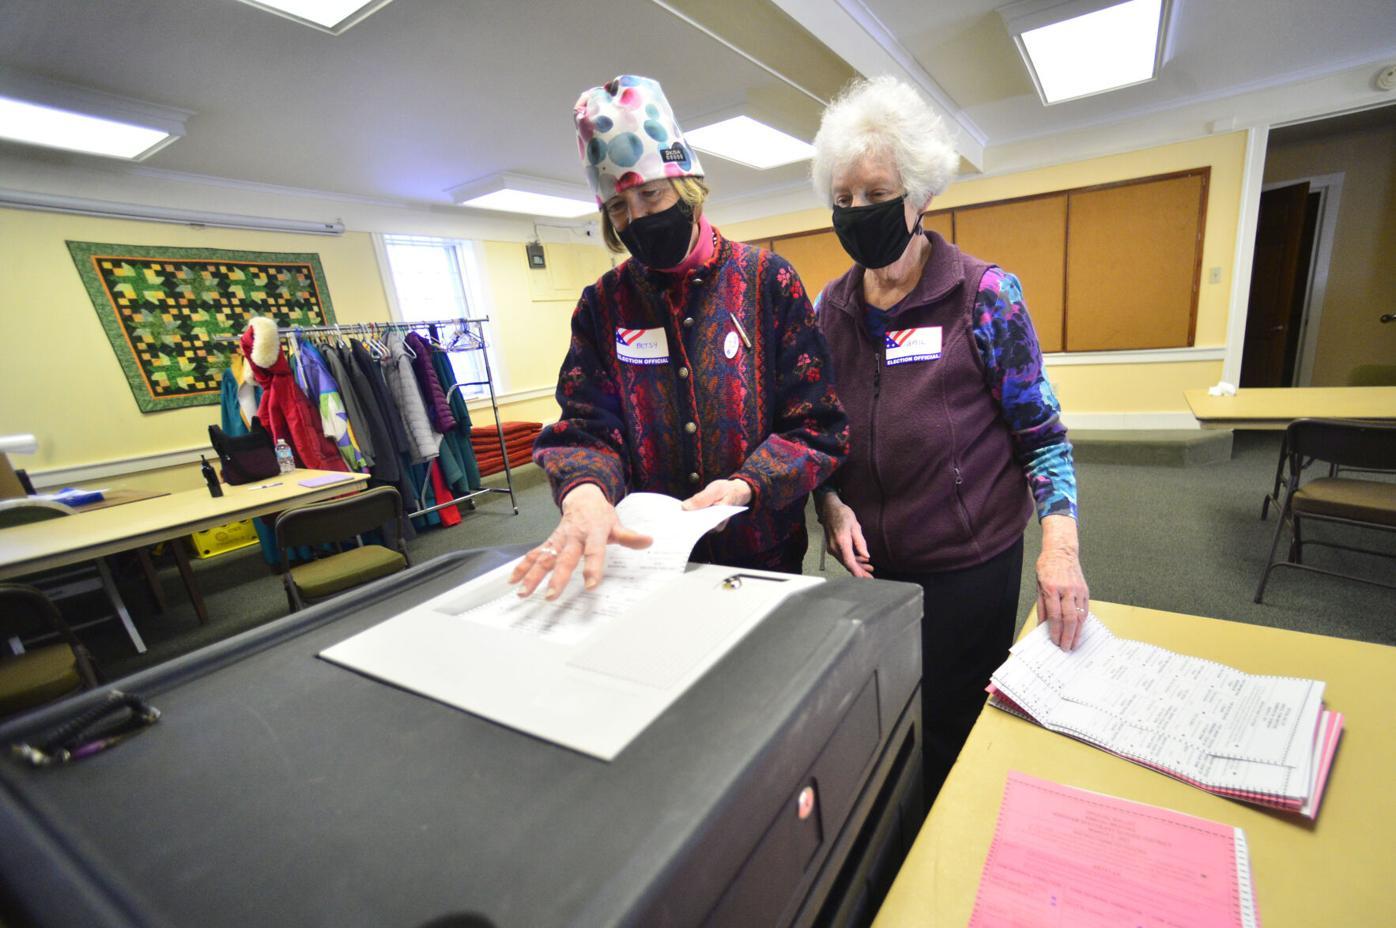 20210302-VOTE-RADDER-19.JPG